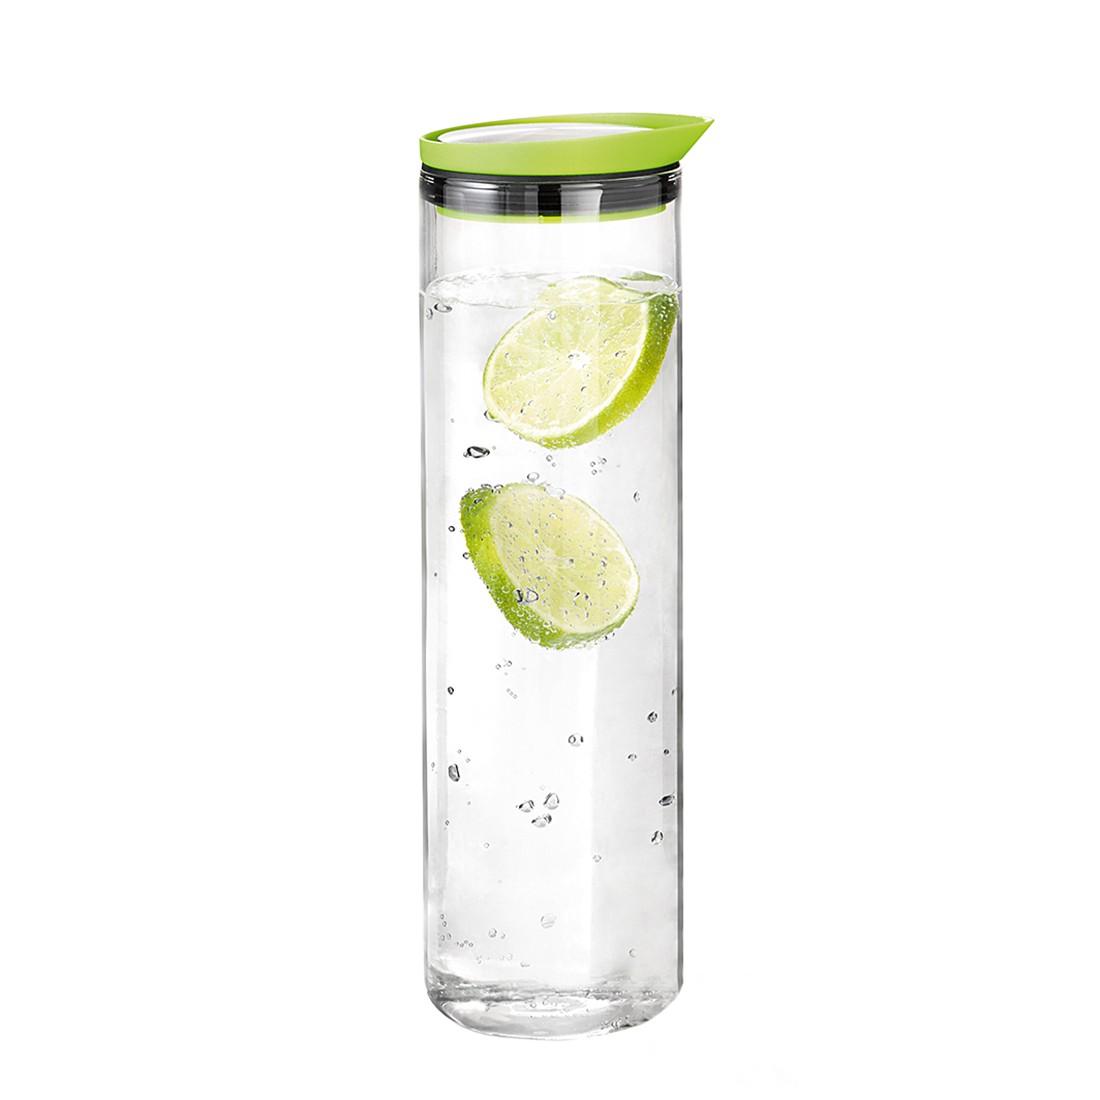 Wasserkaraffe Fontana (1 Liter) – Grün, Blomus online kaufen